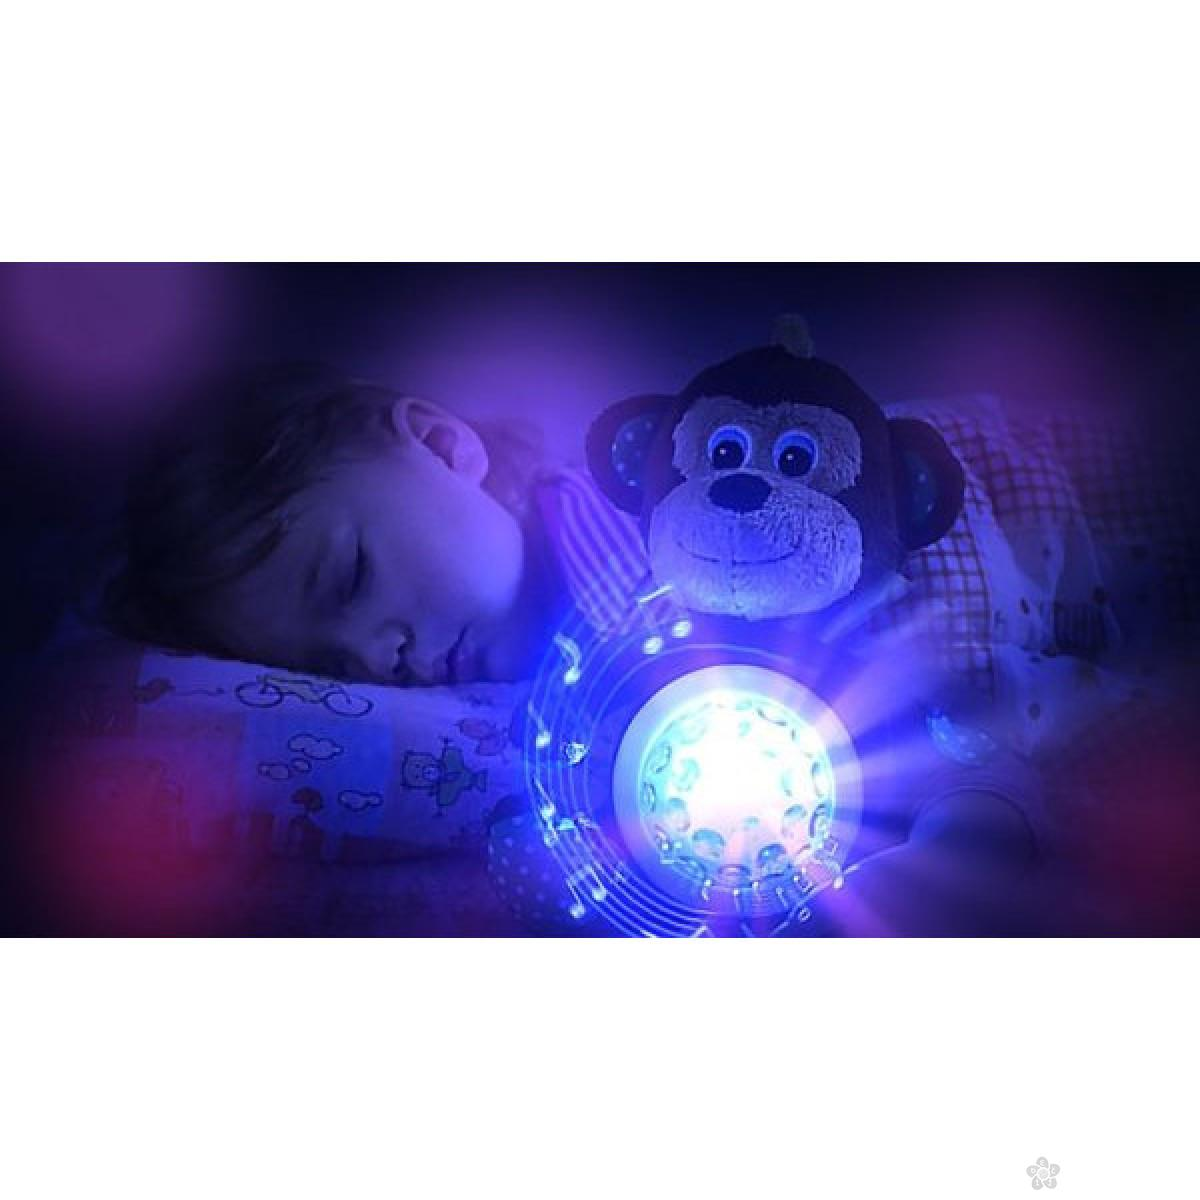 Noćno svetlo Zvezdani ljubimci (Starlight pets) – Zeka, TS52851